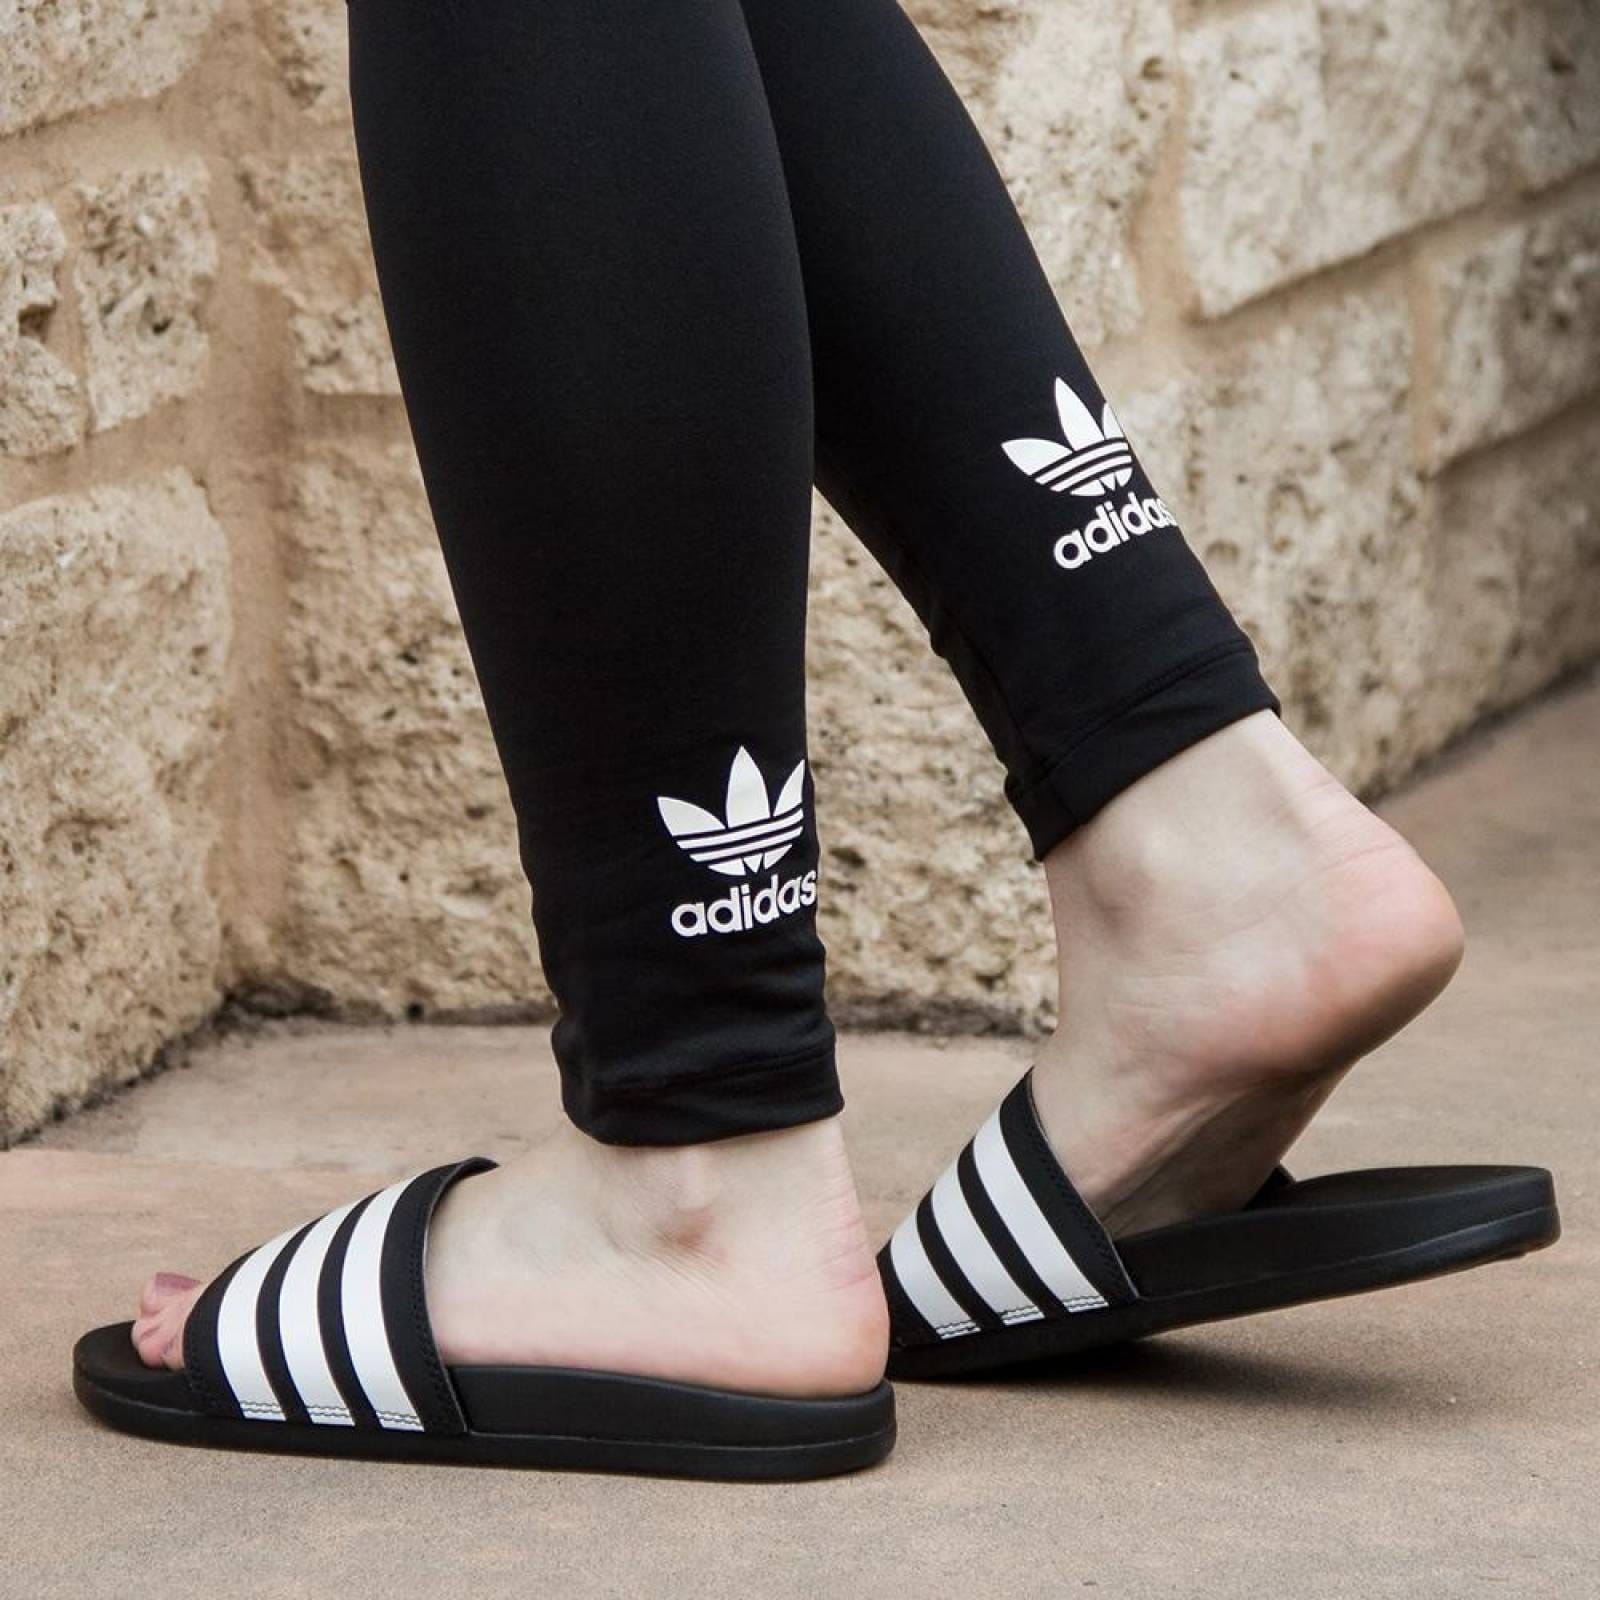 Sandalias Adidas Adilette Comfort AP9971 Negro Hombre